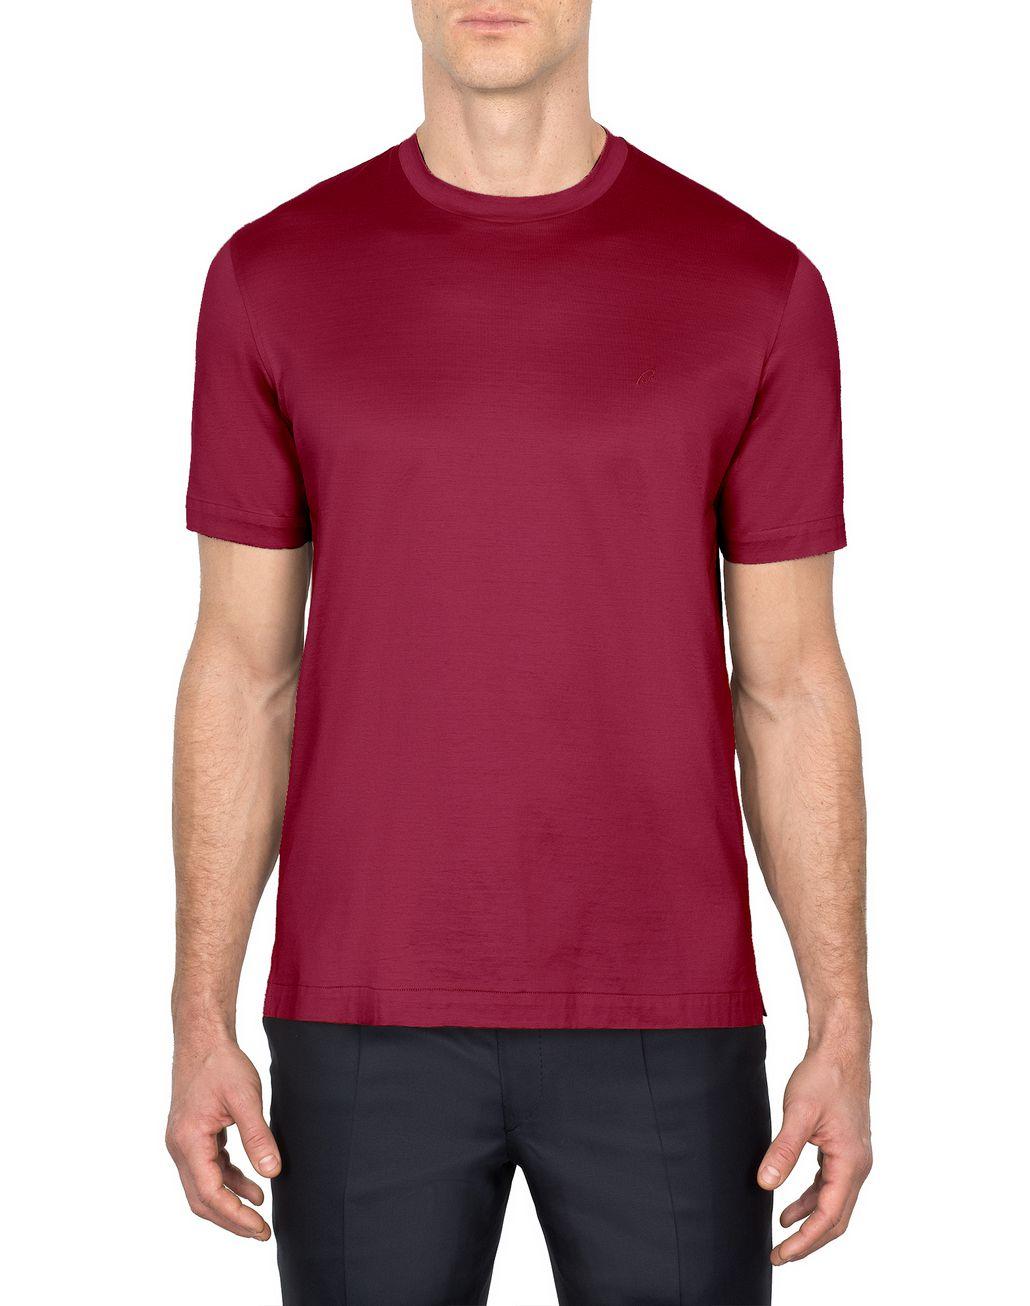 BRIONI Bordeaux Logoed T-Shirt T-Shirts & Polos Man r